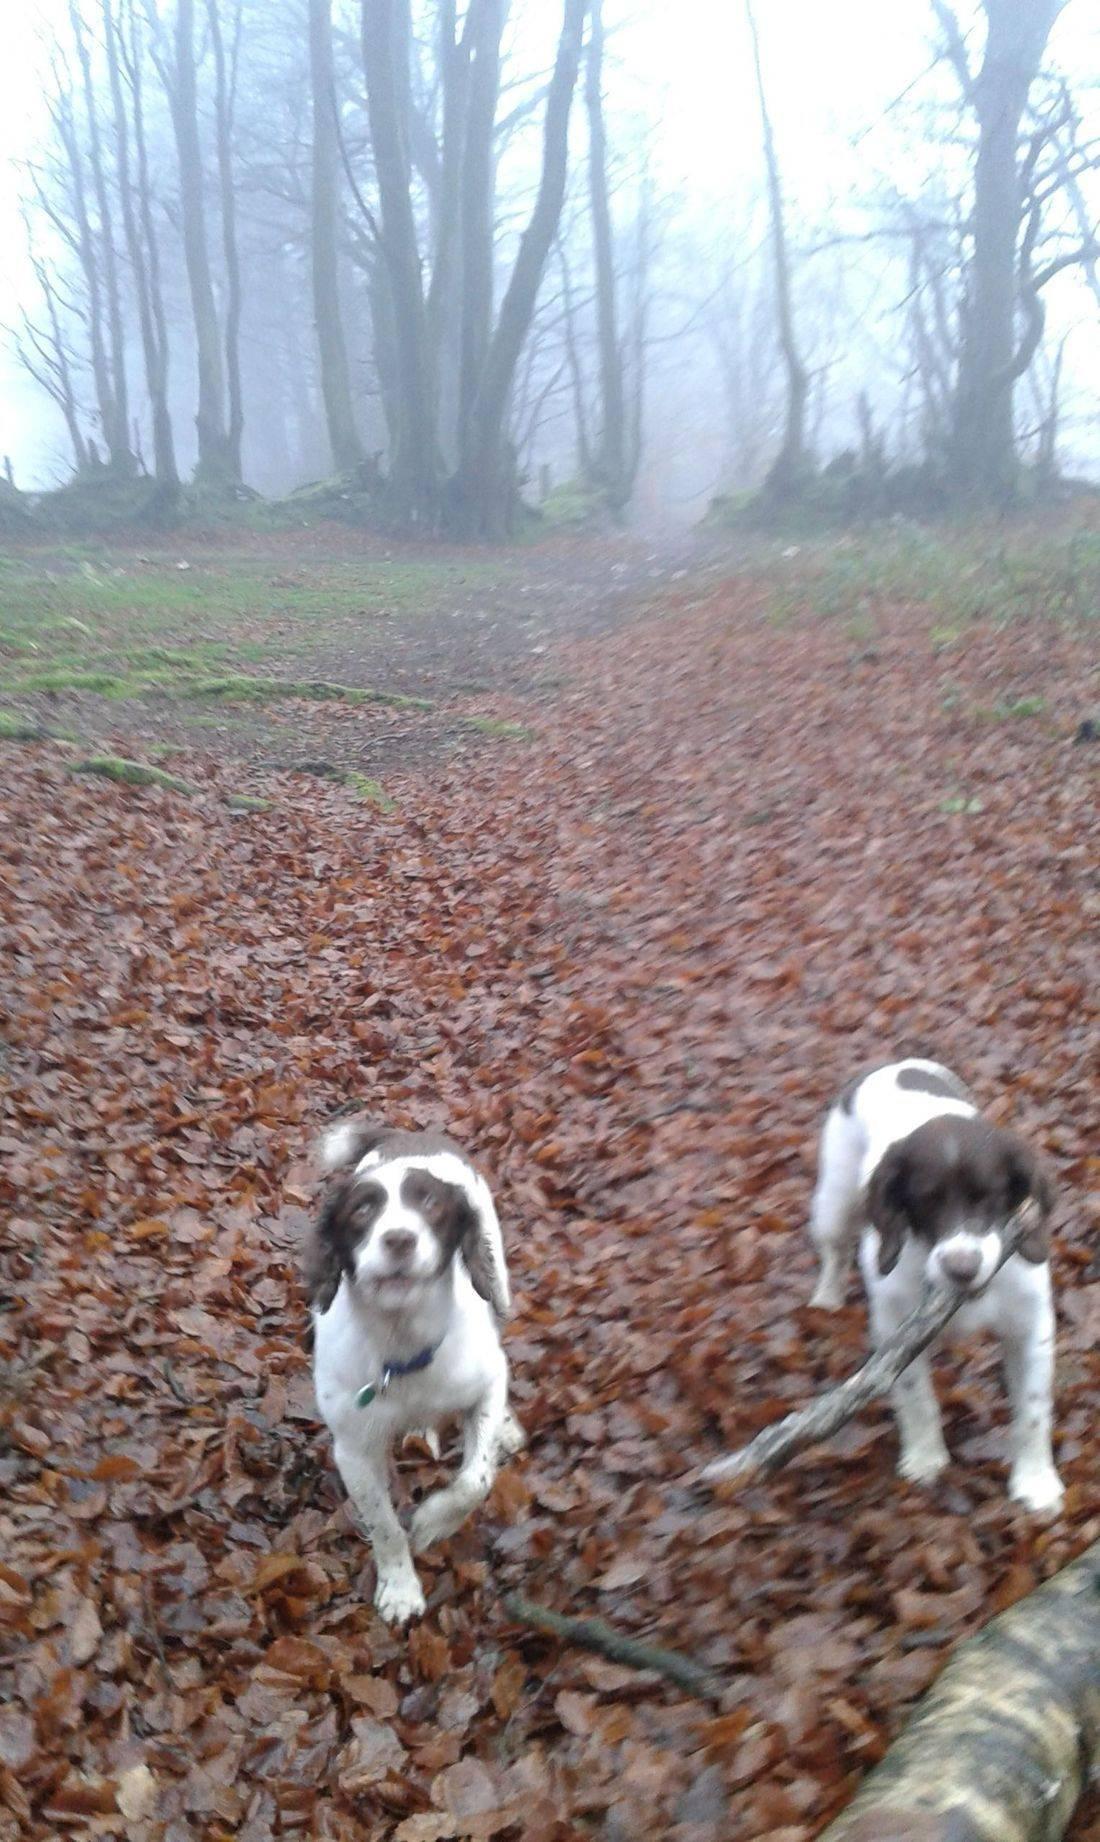 Springer spaniels in the misty woods